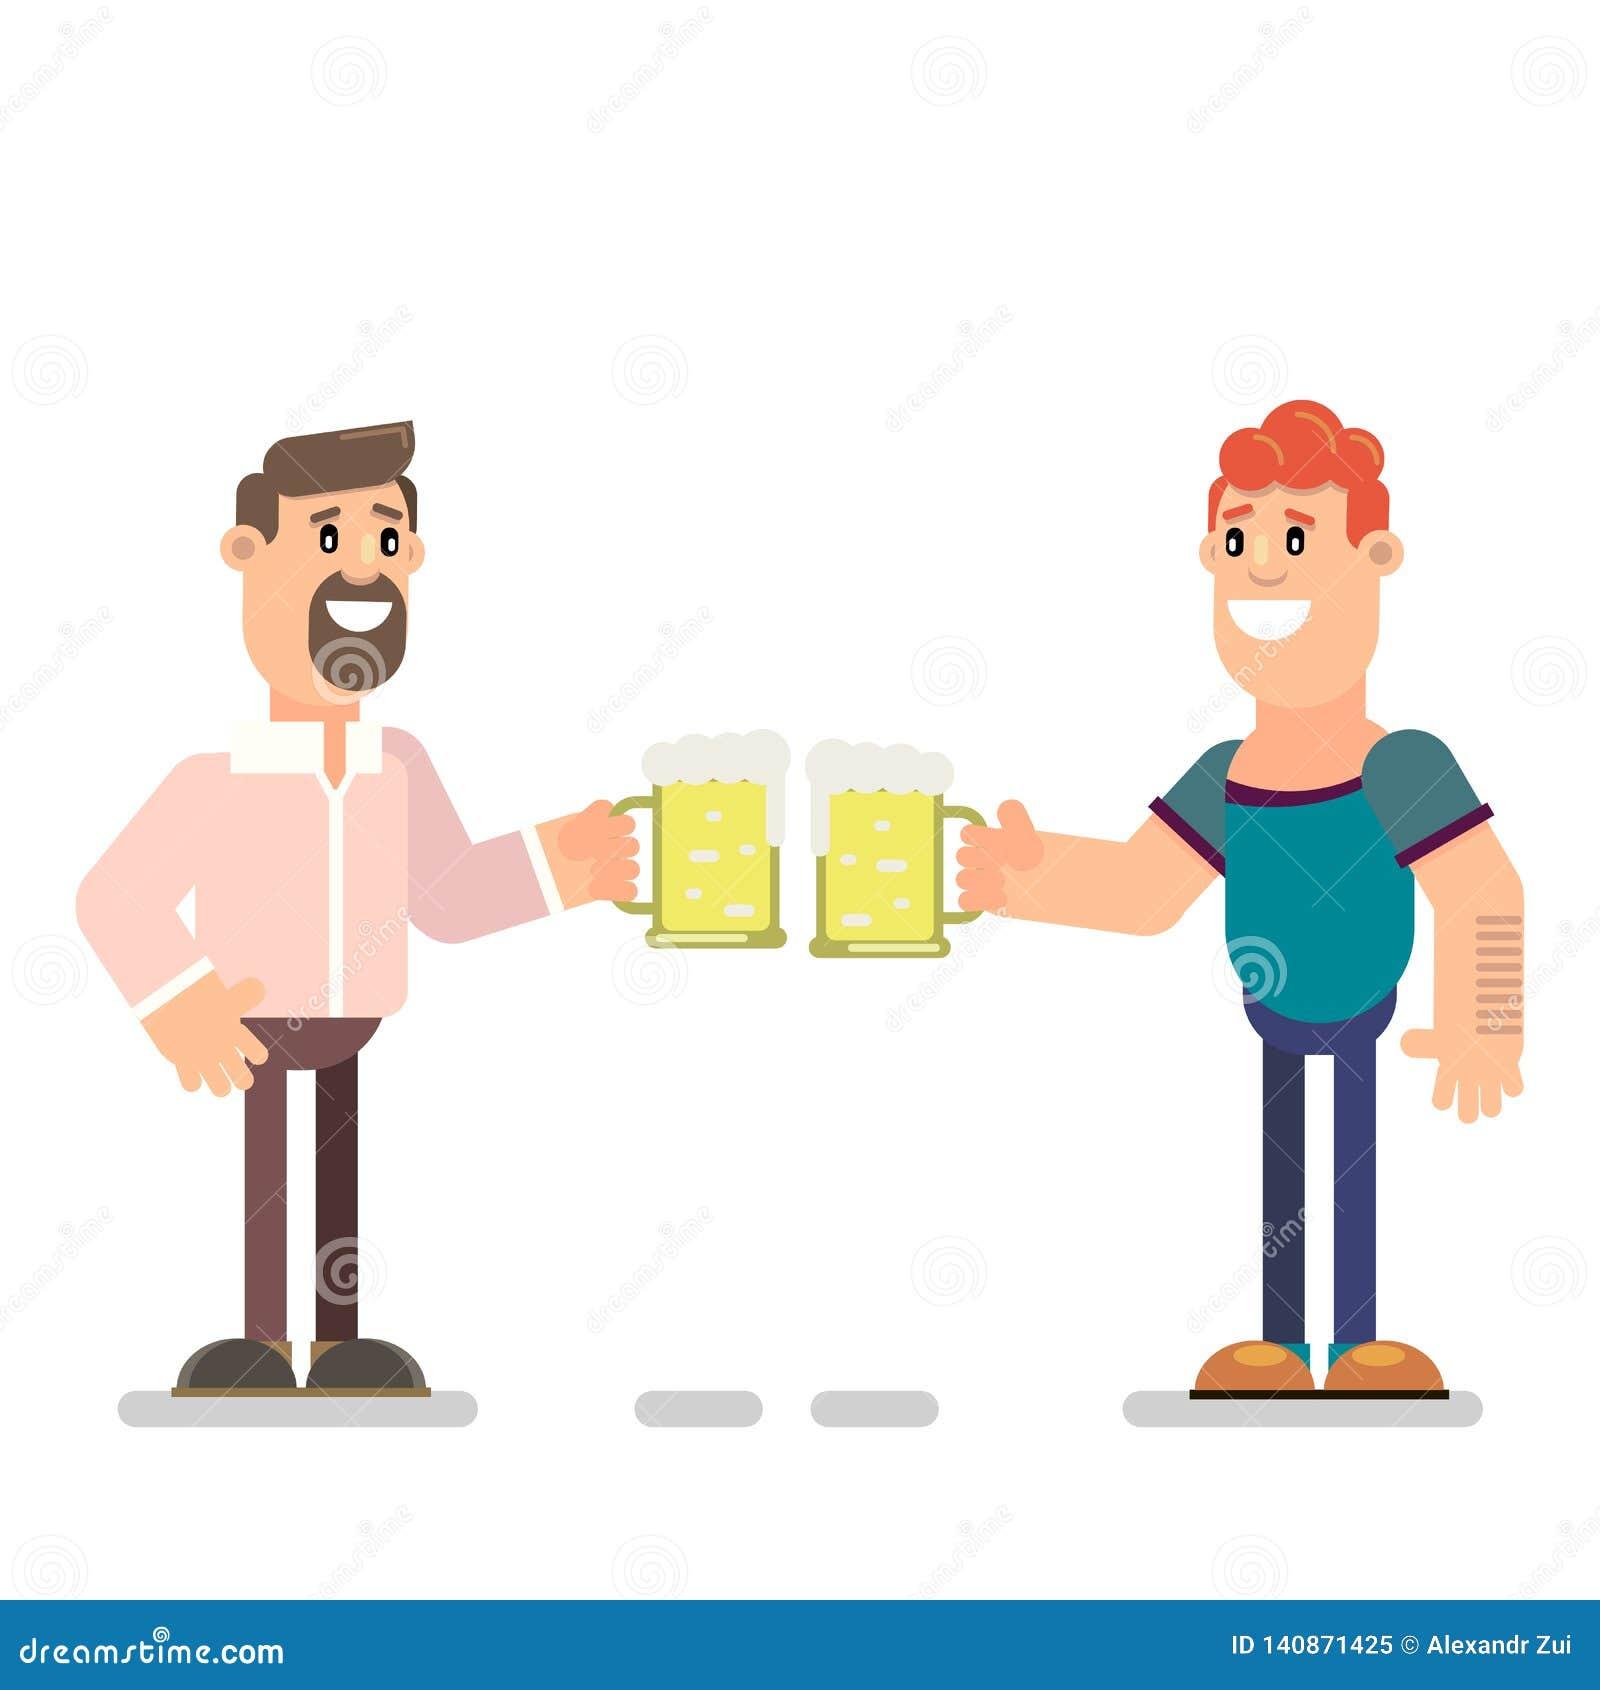 Guys drink beer